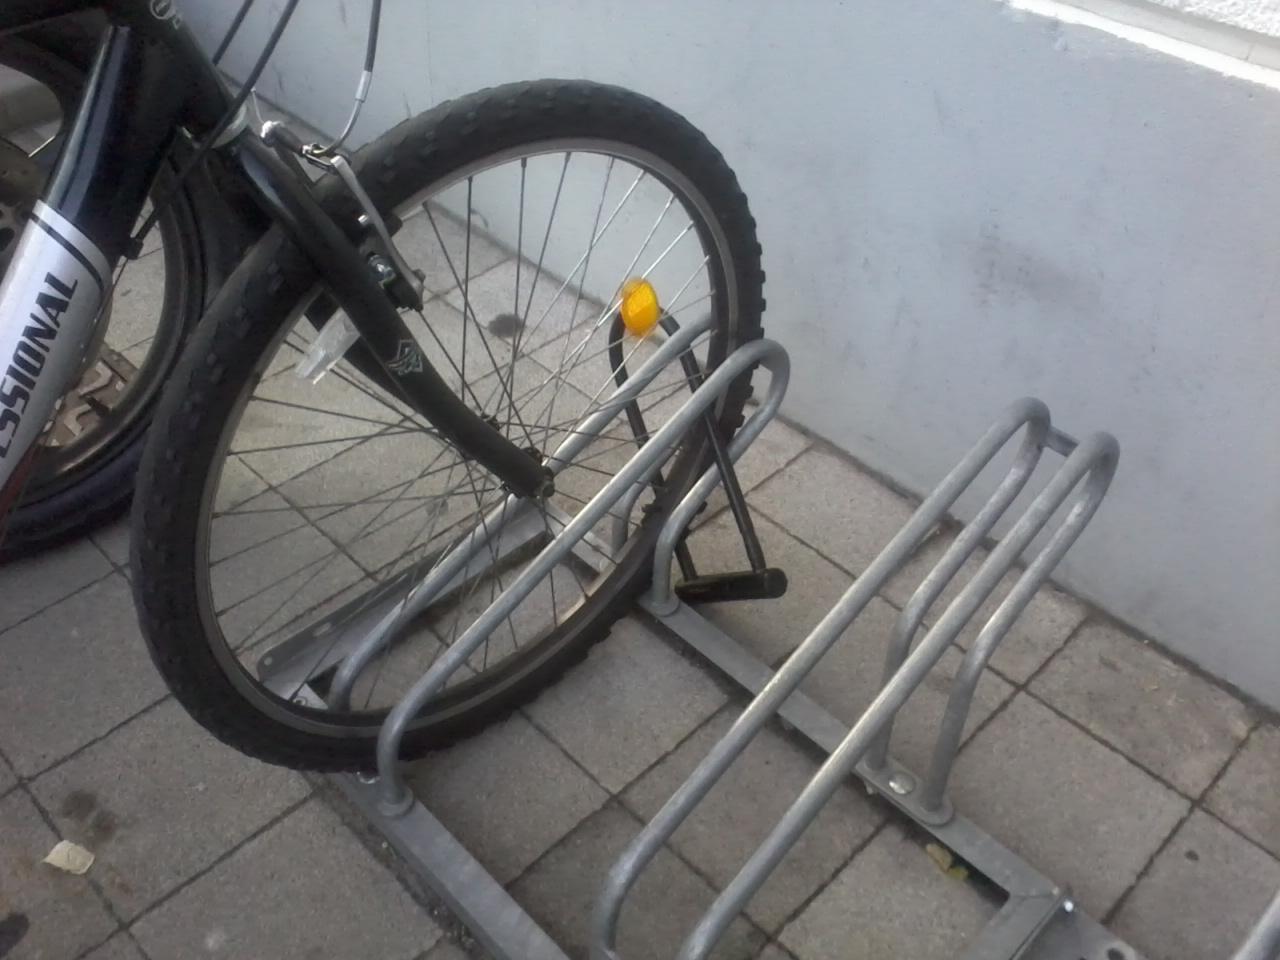 Kennington People On Bikes Lidl Quality Or Crap